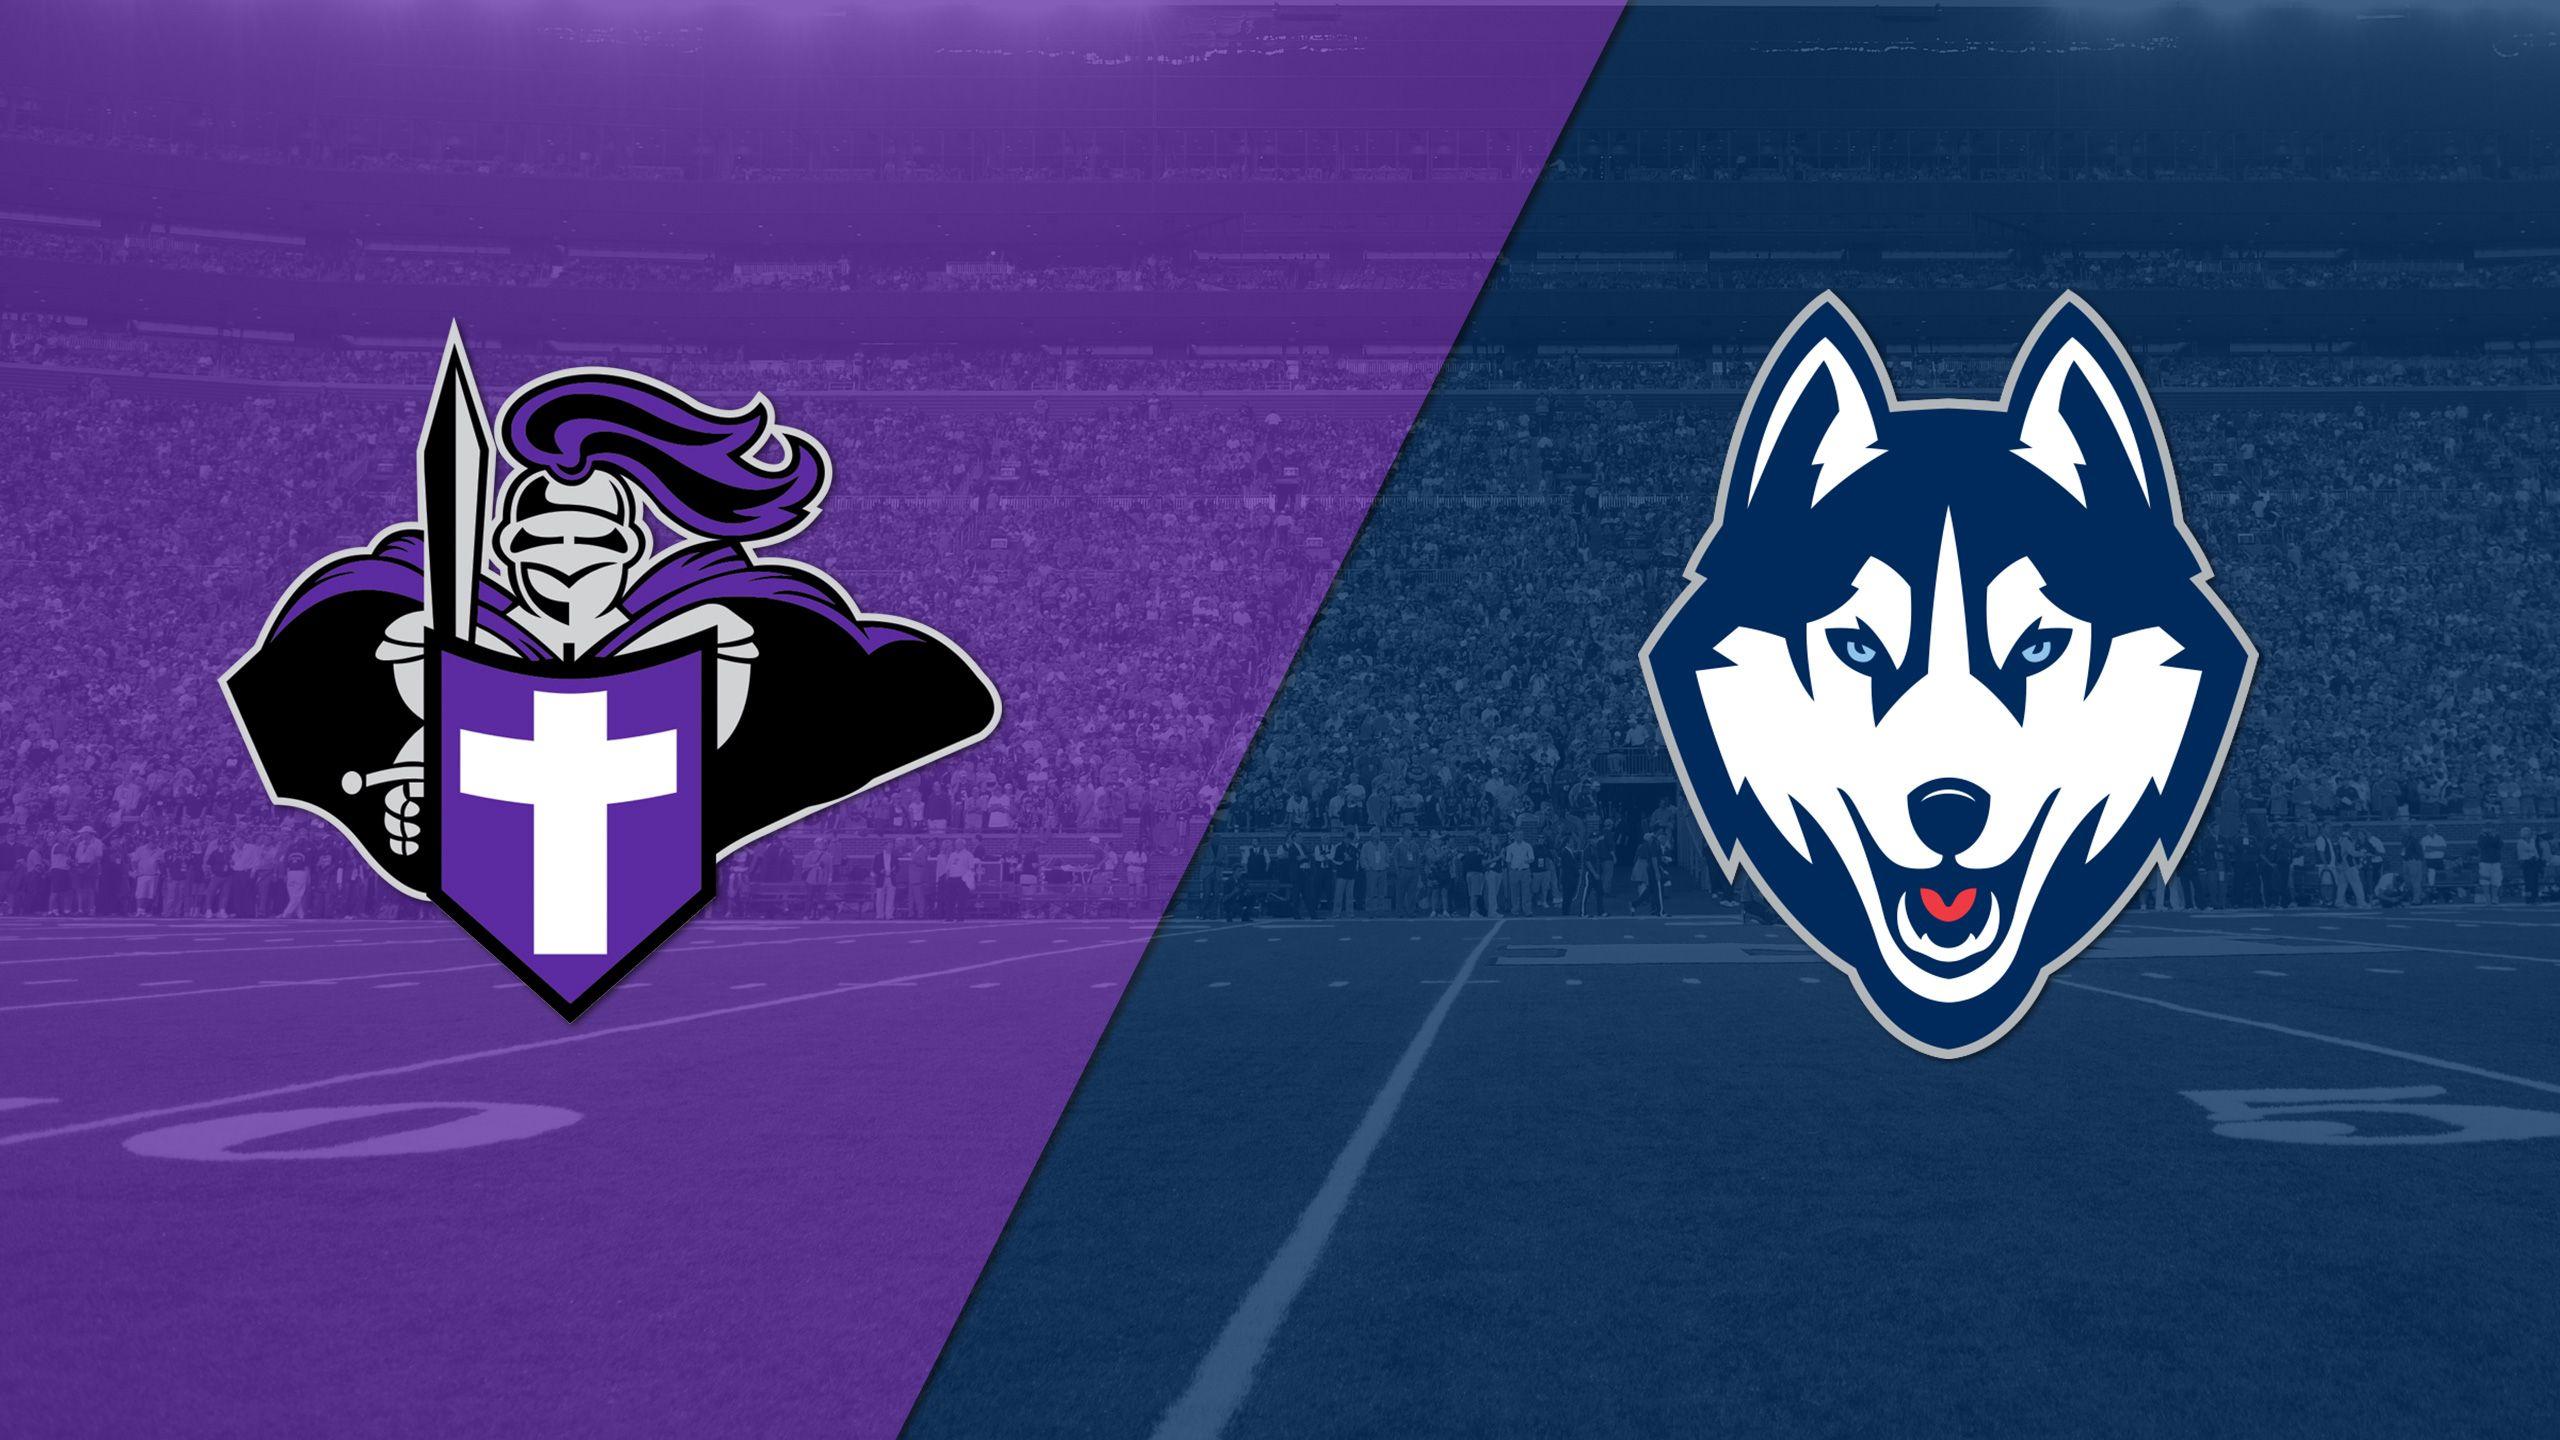 Holy Cross vs. Connecticut (Football)